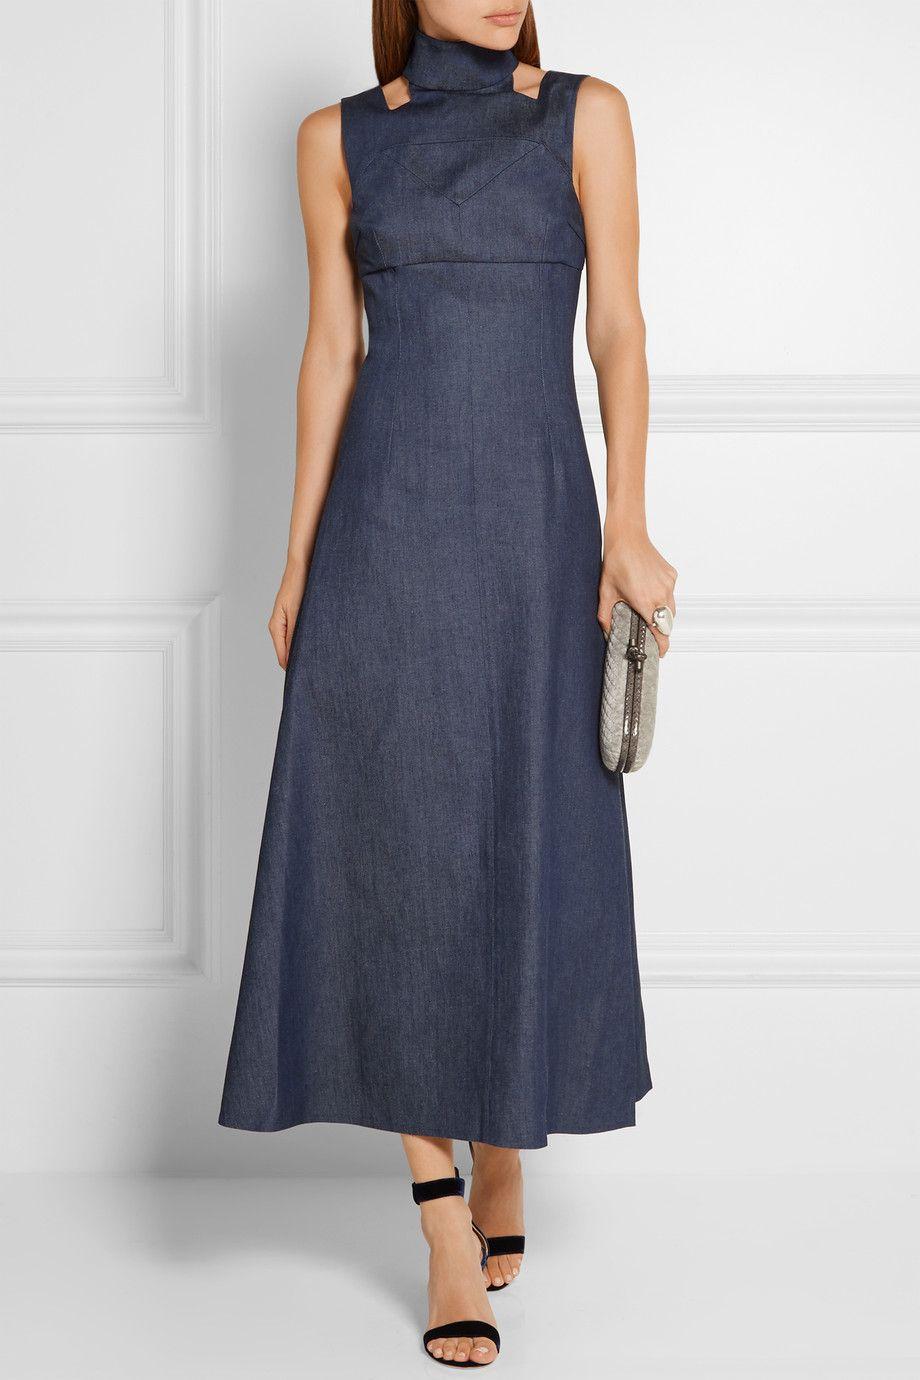 emilia wickstead robe longue en jean d coupes mary. Black Bedroom Furniture Sets. Home Design Ideas